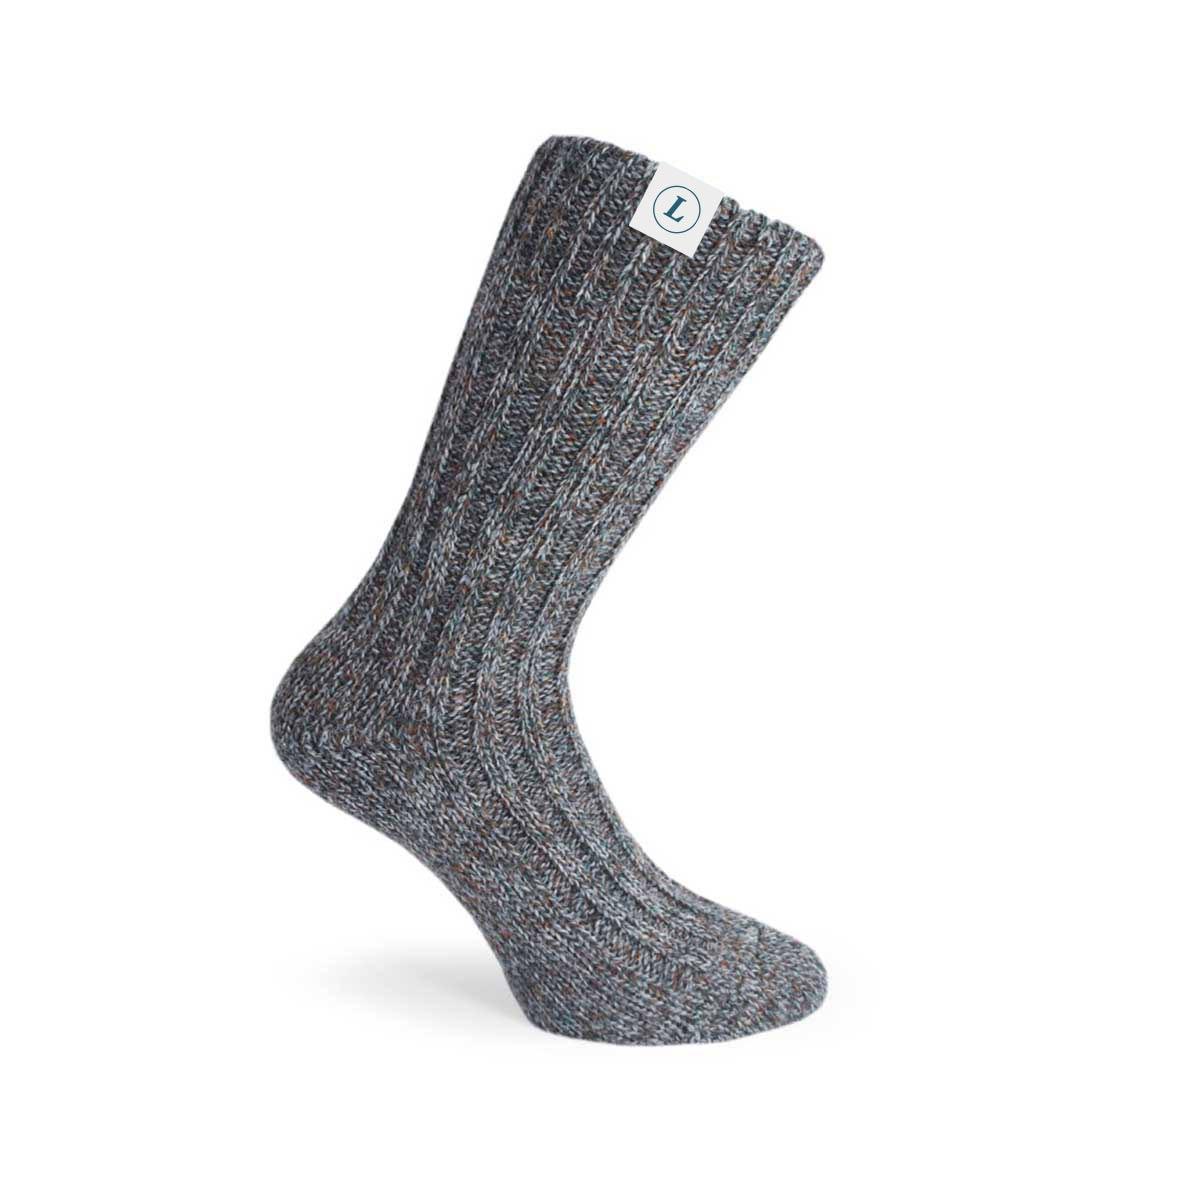 166158 woven wool socks full color woven hem tag